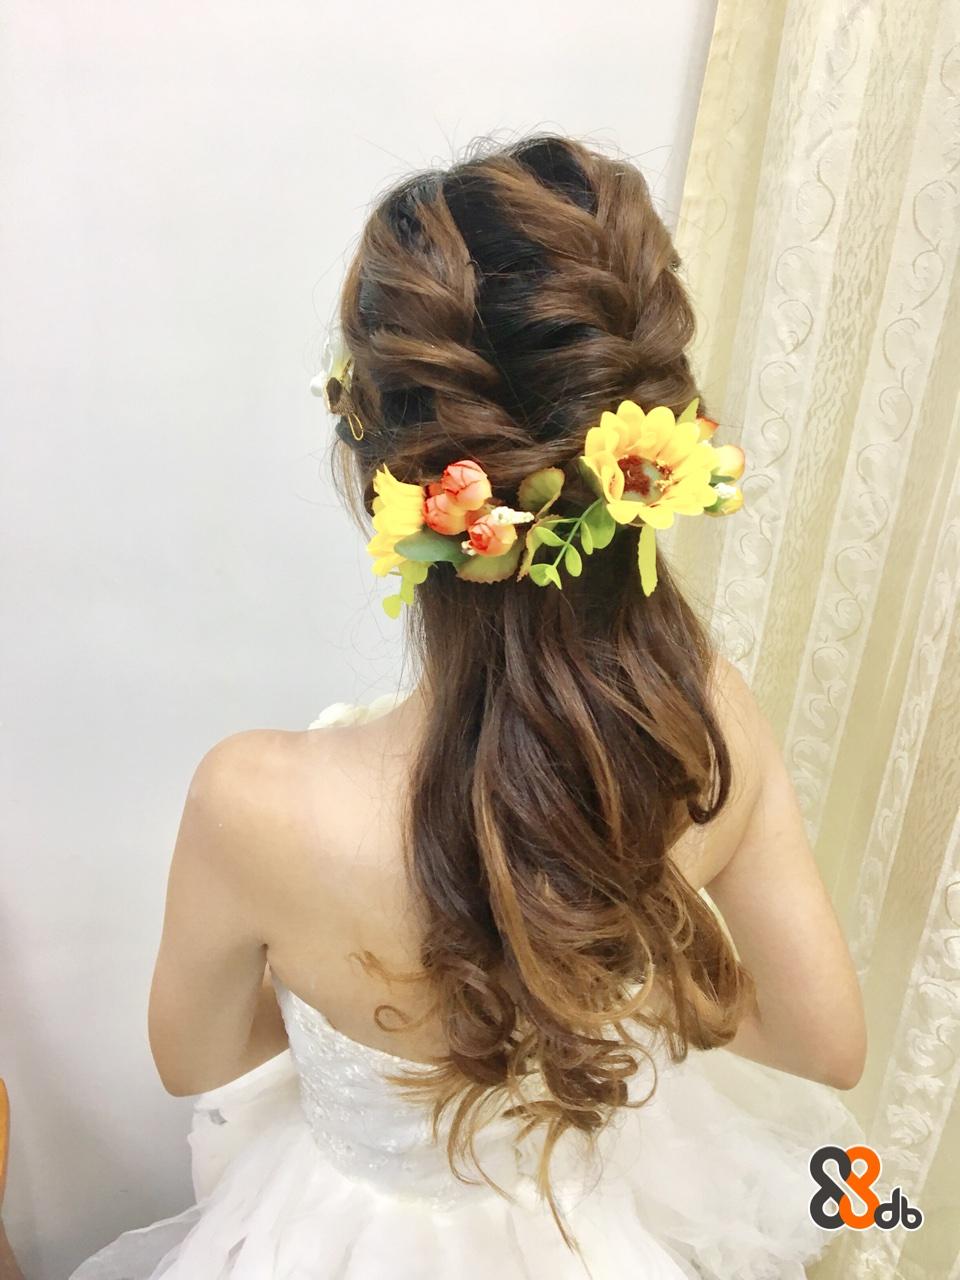 hair,flower,bride,hairstyle,headpiece